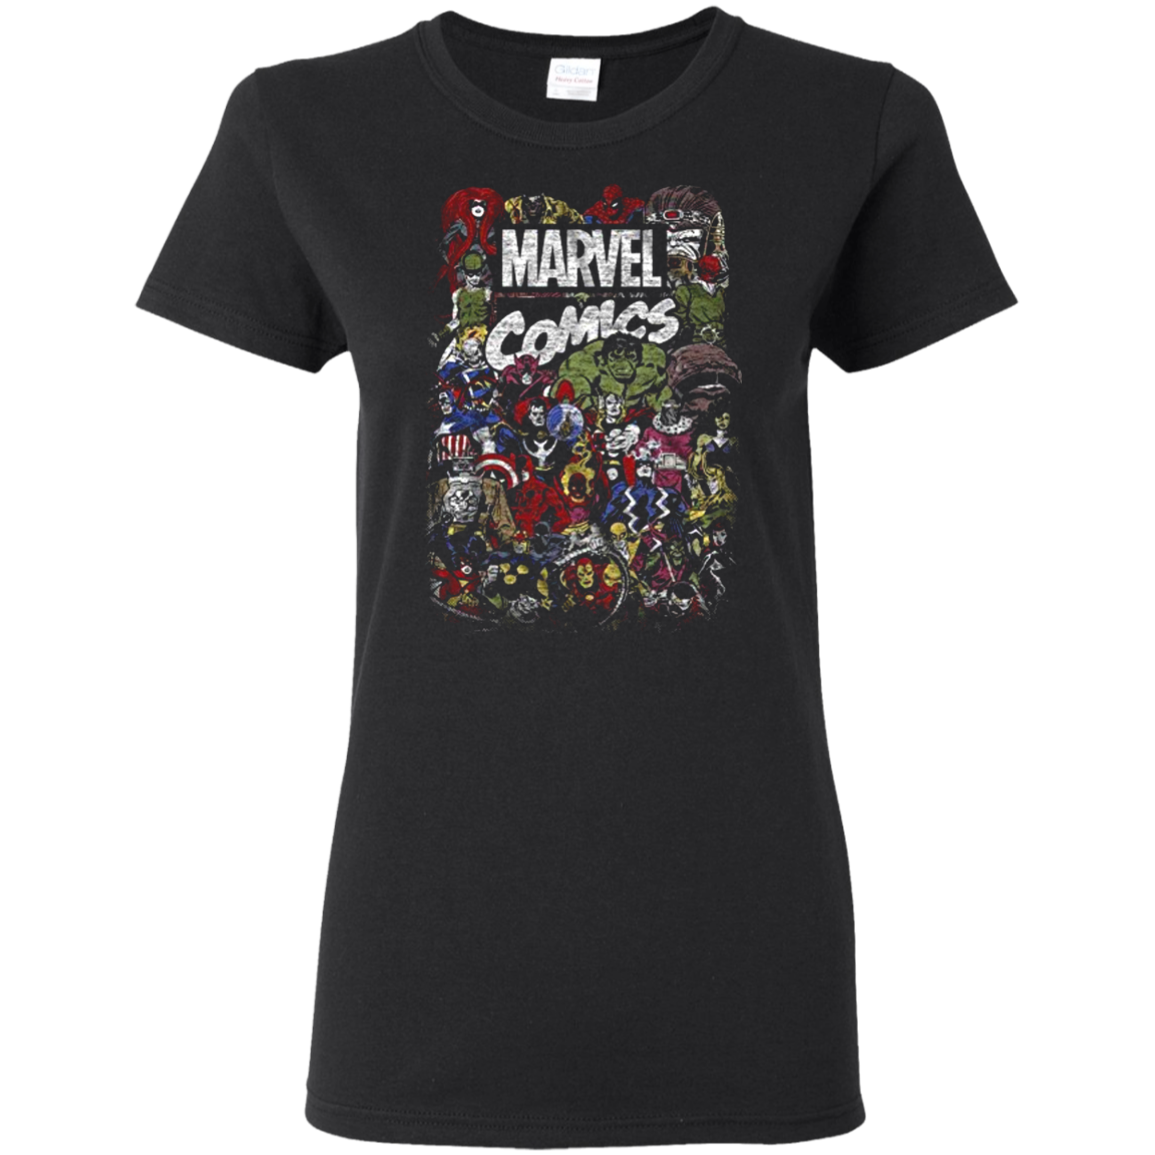 Comics Logo Thor Hulk Iron Man Avengers Spiderman Daredevil Strange Loki Thanos T shirt hoodie sweater Women 5.3